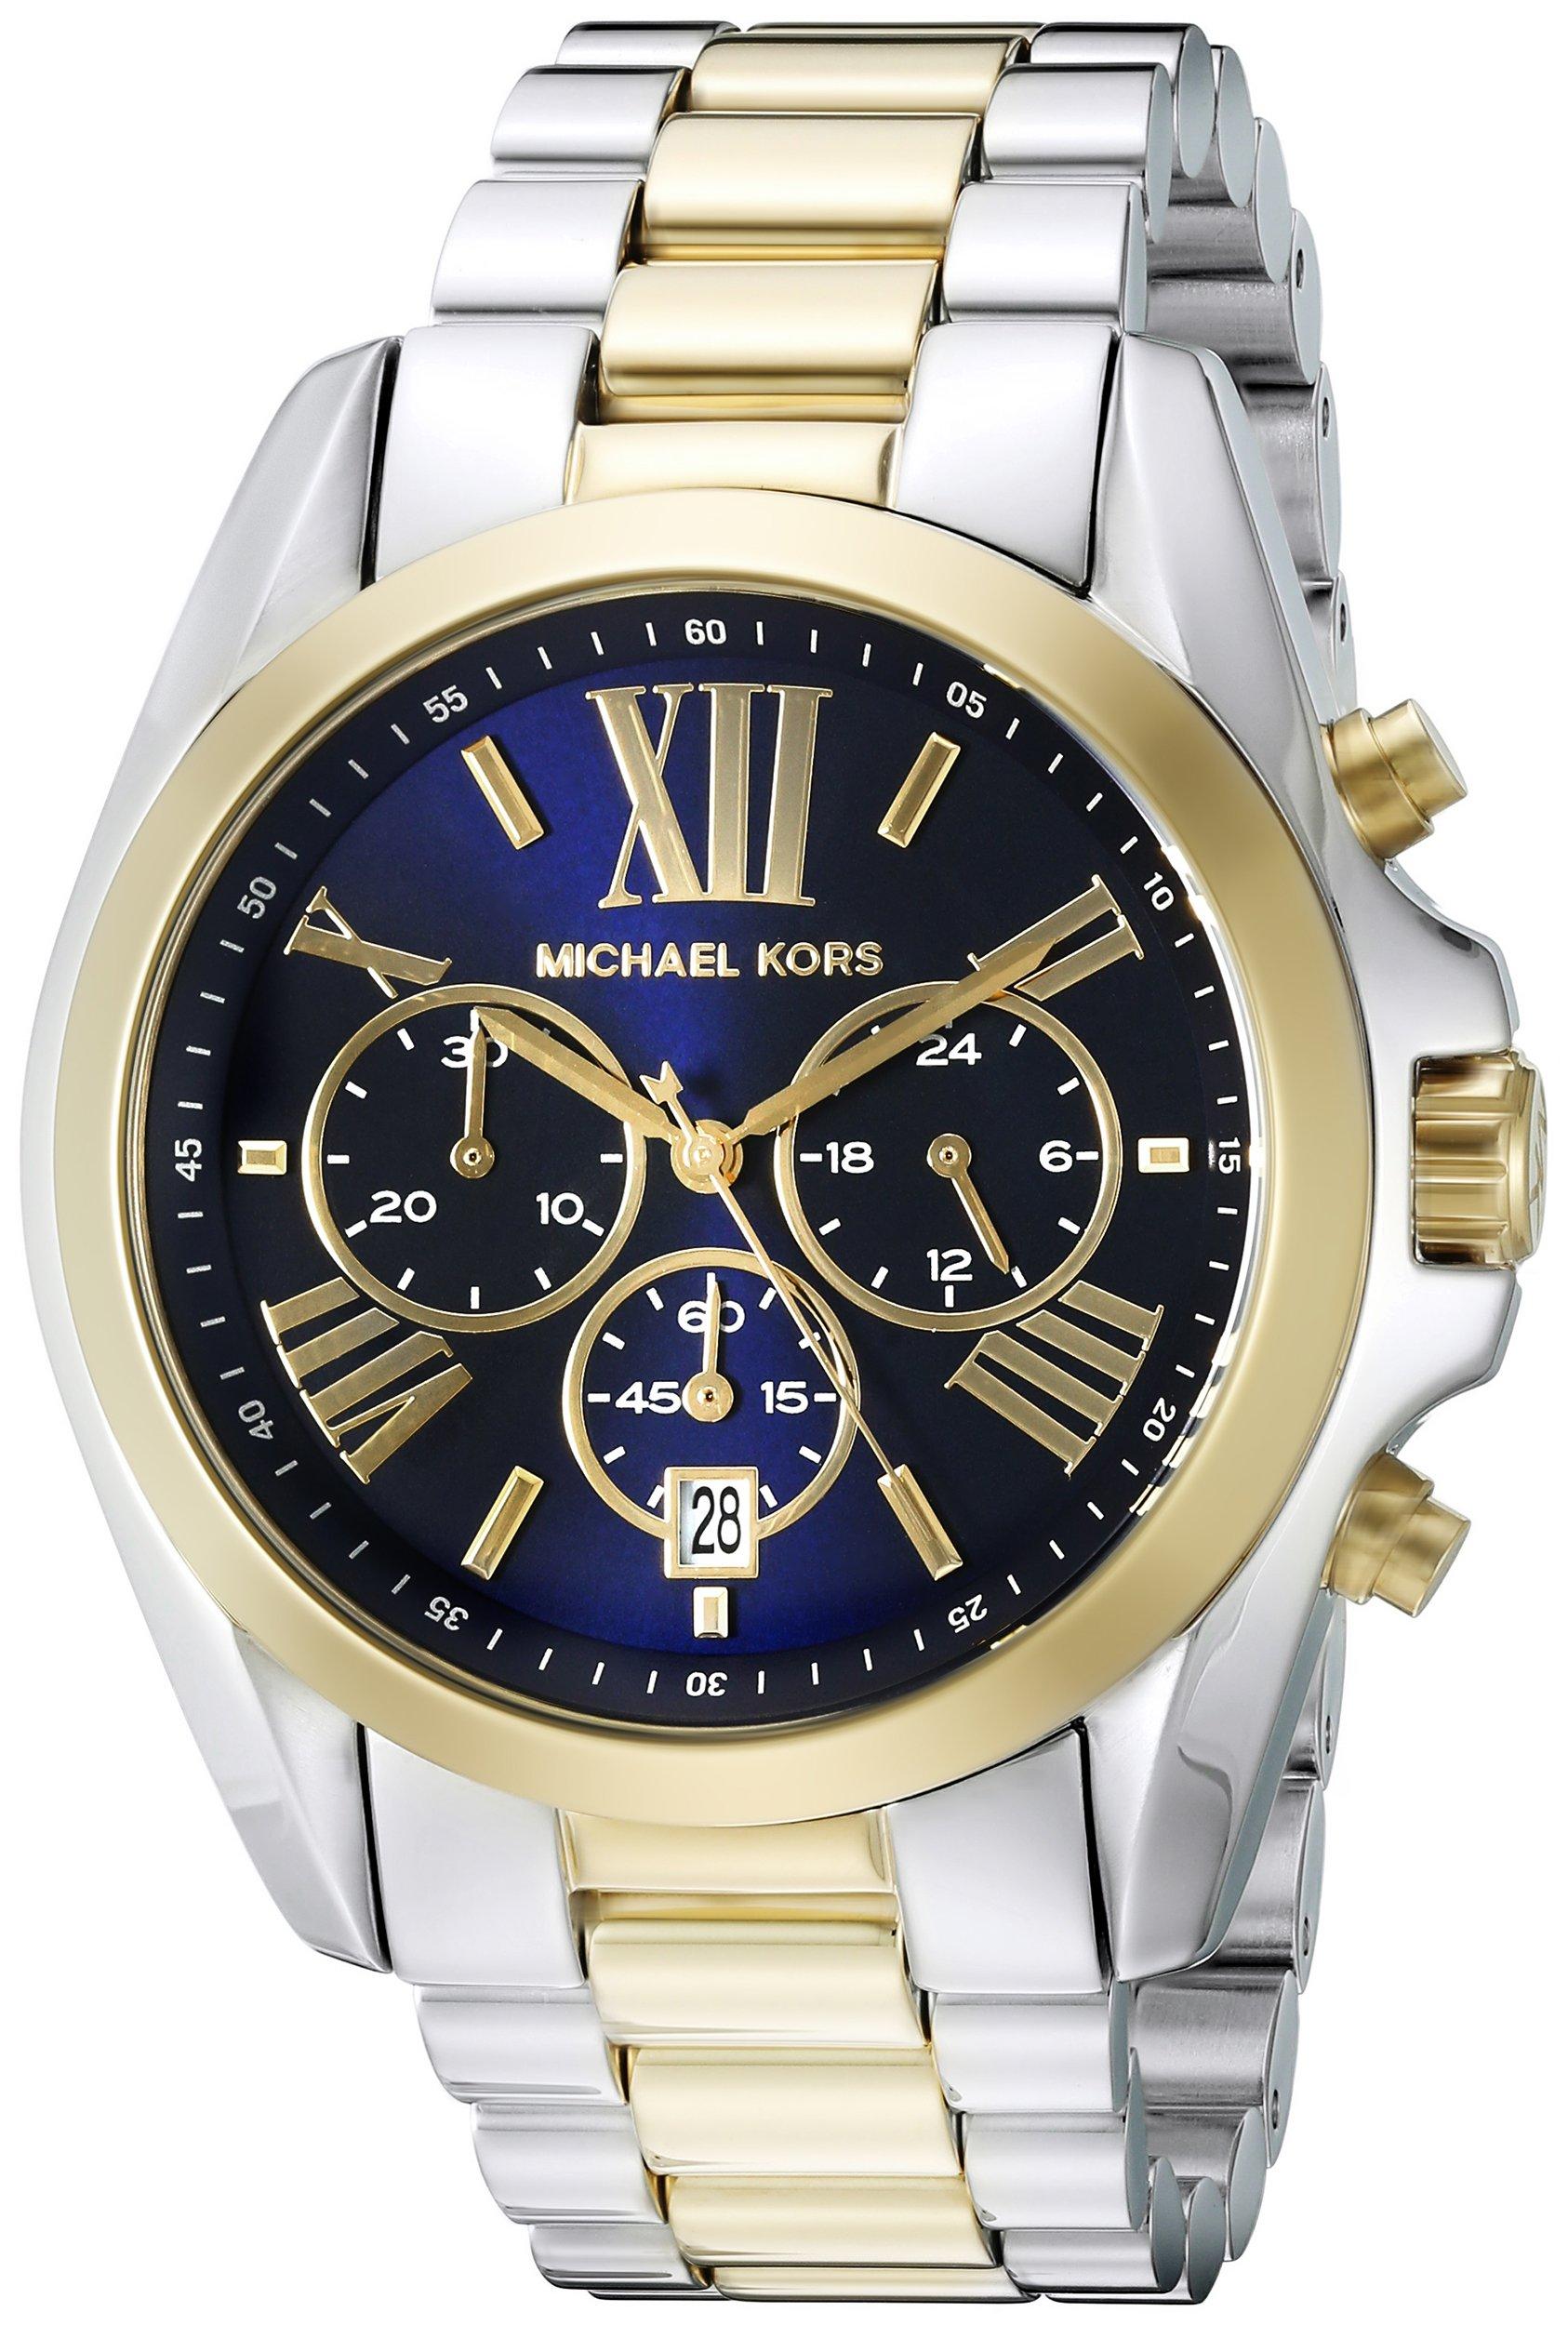 Michael Kors Reloj de pulsera mujer mk5976Cronógrafo Plata Women